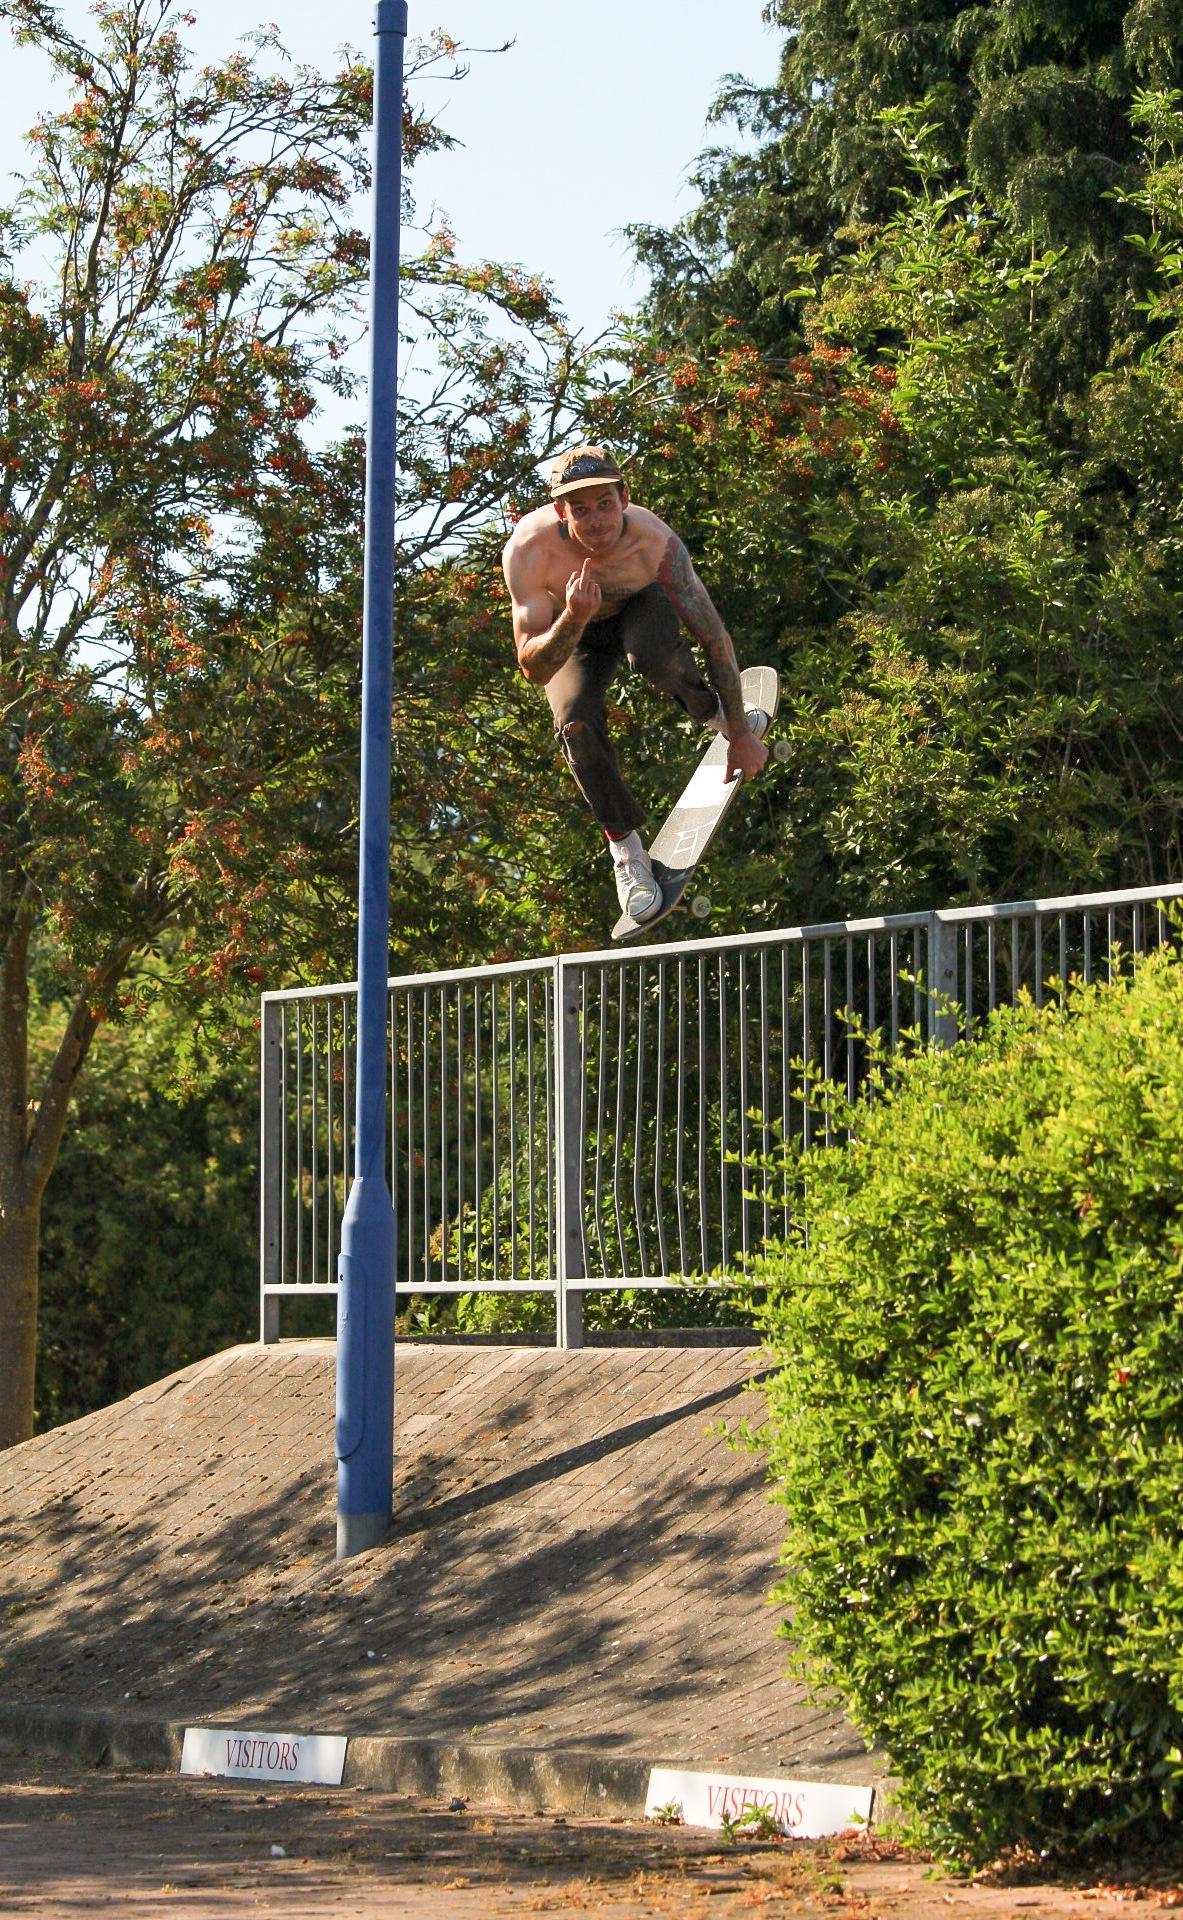 flipping the bird  by Dan whitney